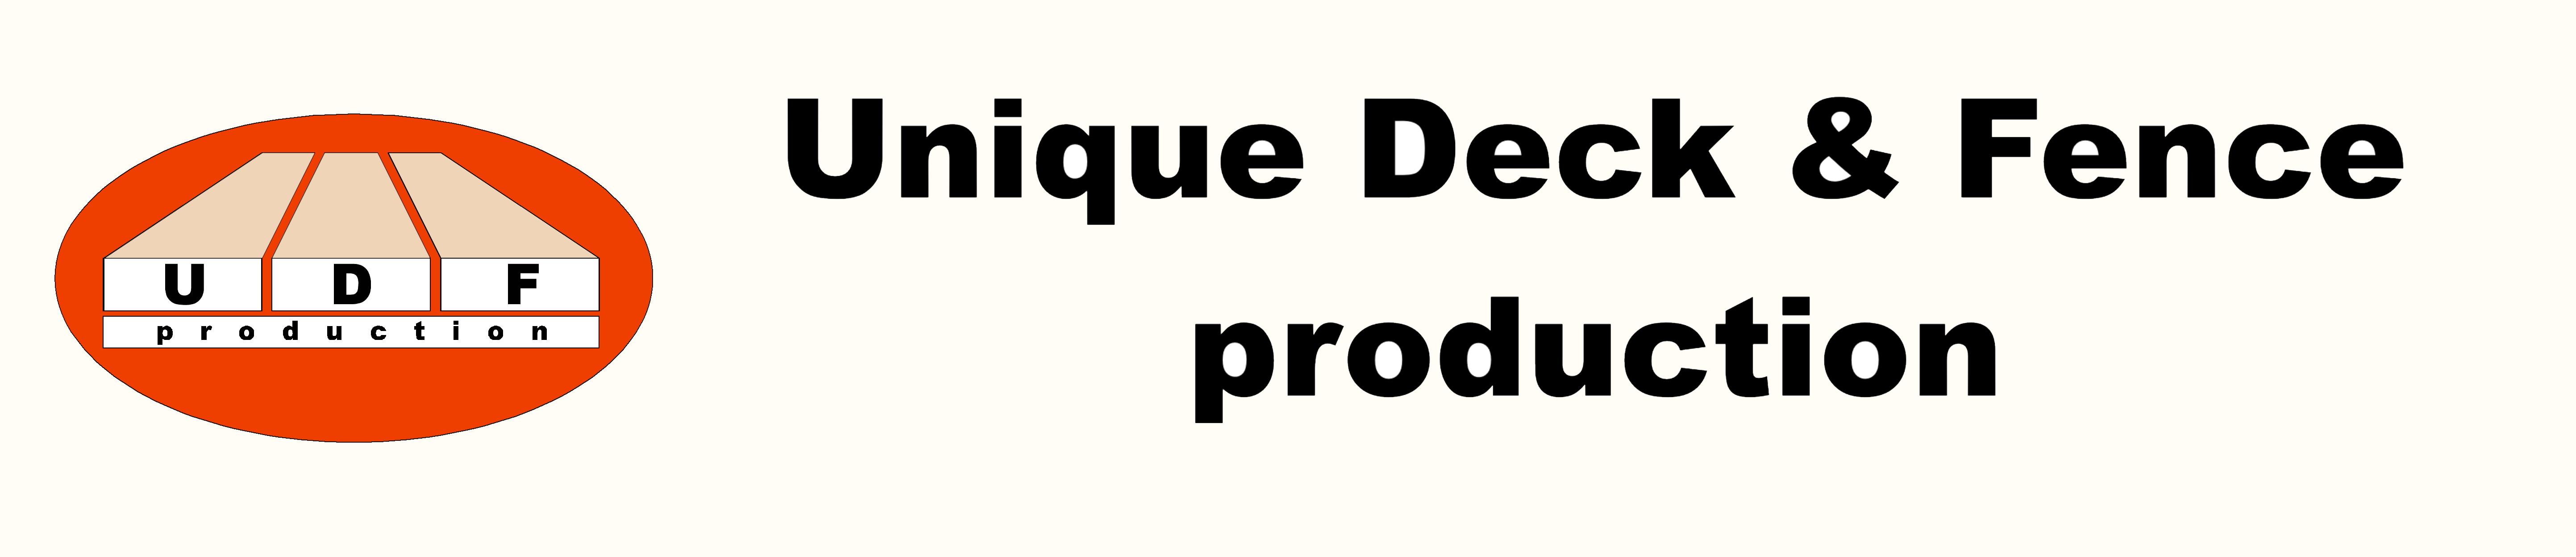 UDF Production